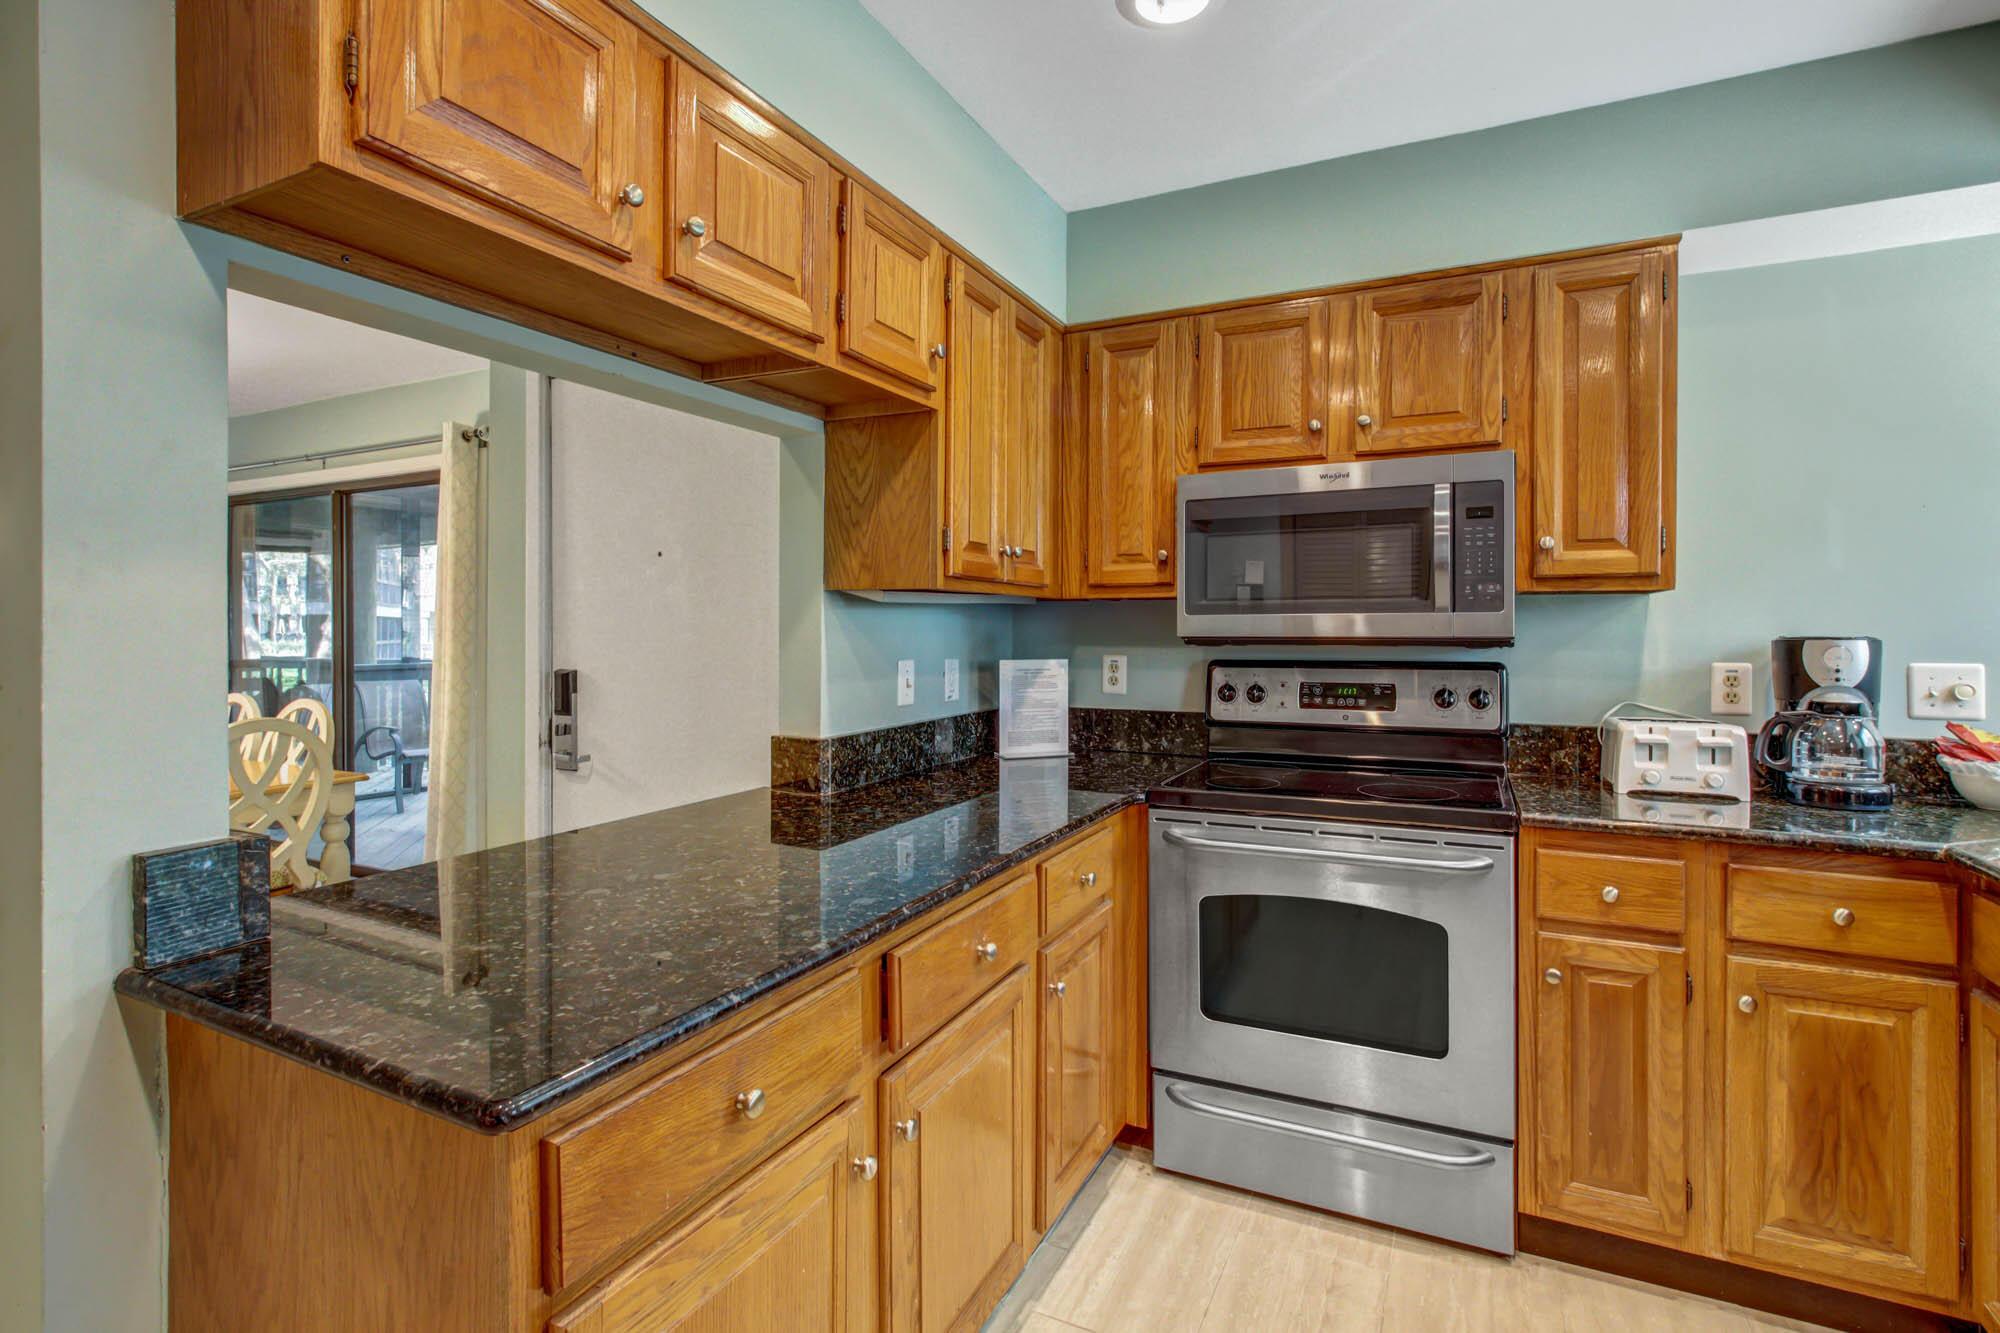 Kiawah Island Condos For Sale - 4525 Park Lake, Kiawah Island, SC - 36